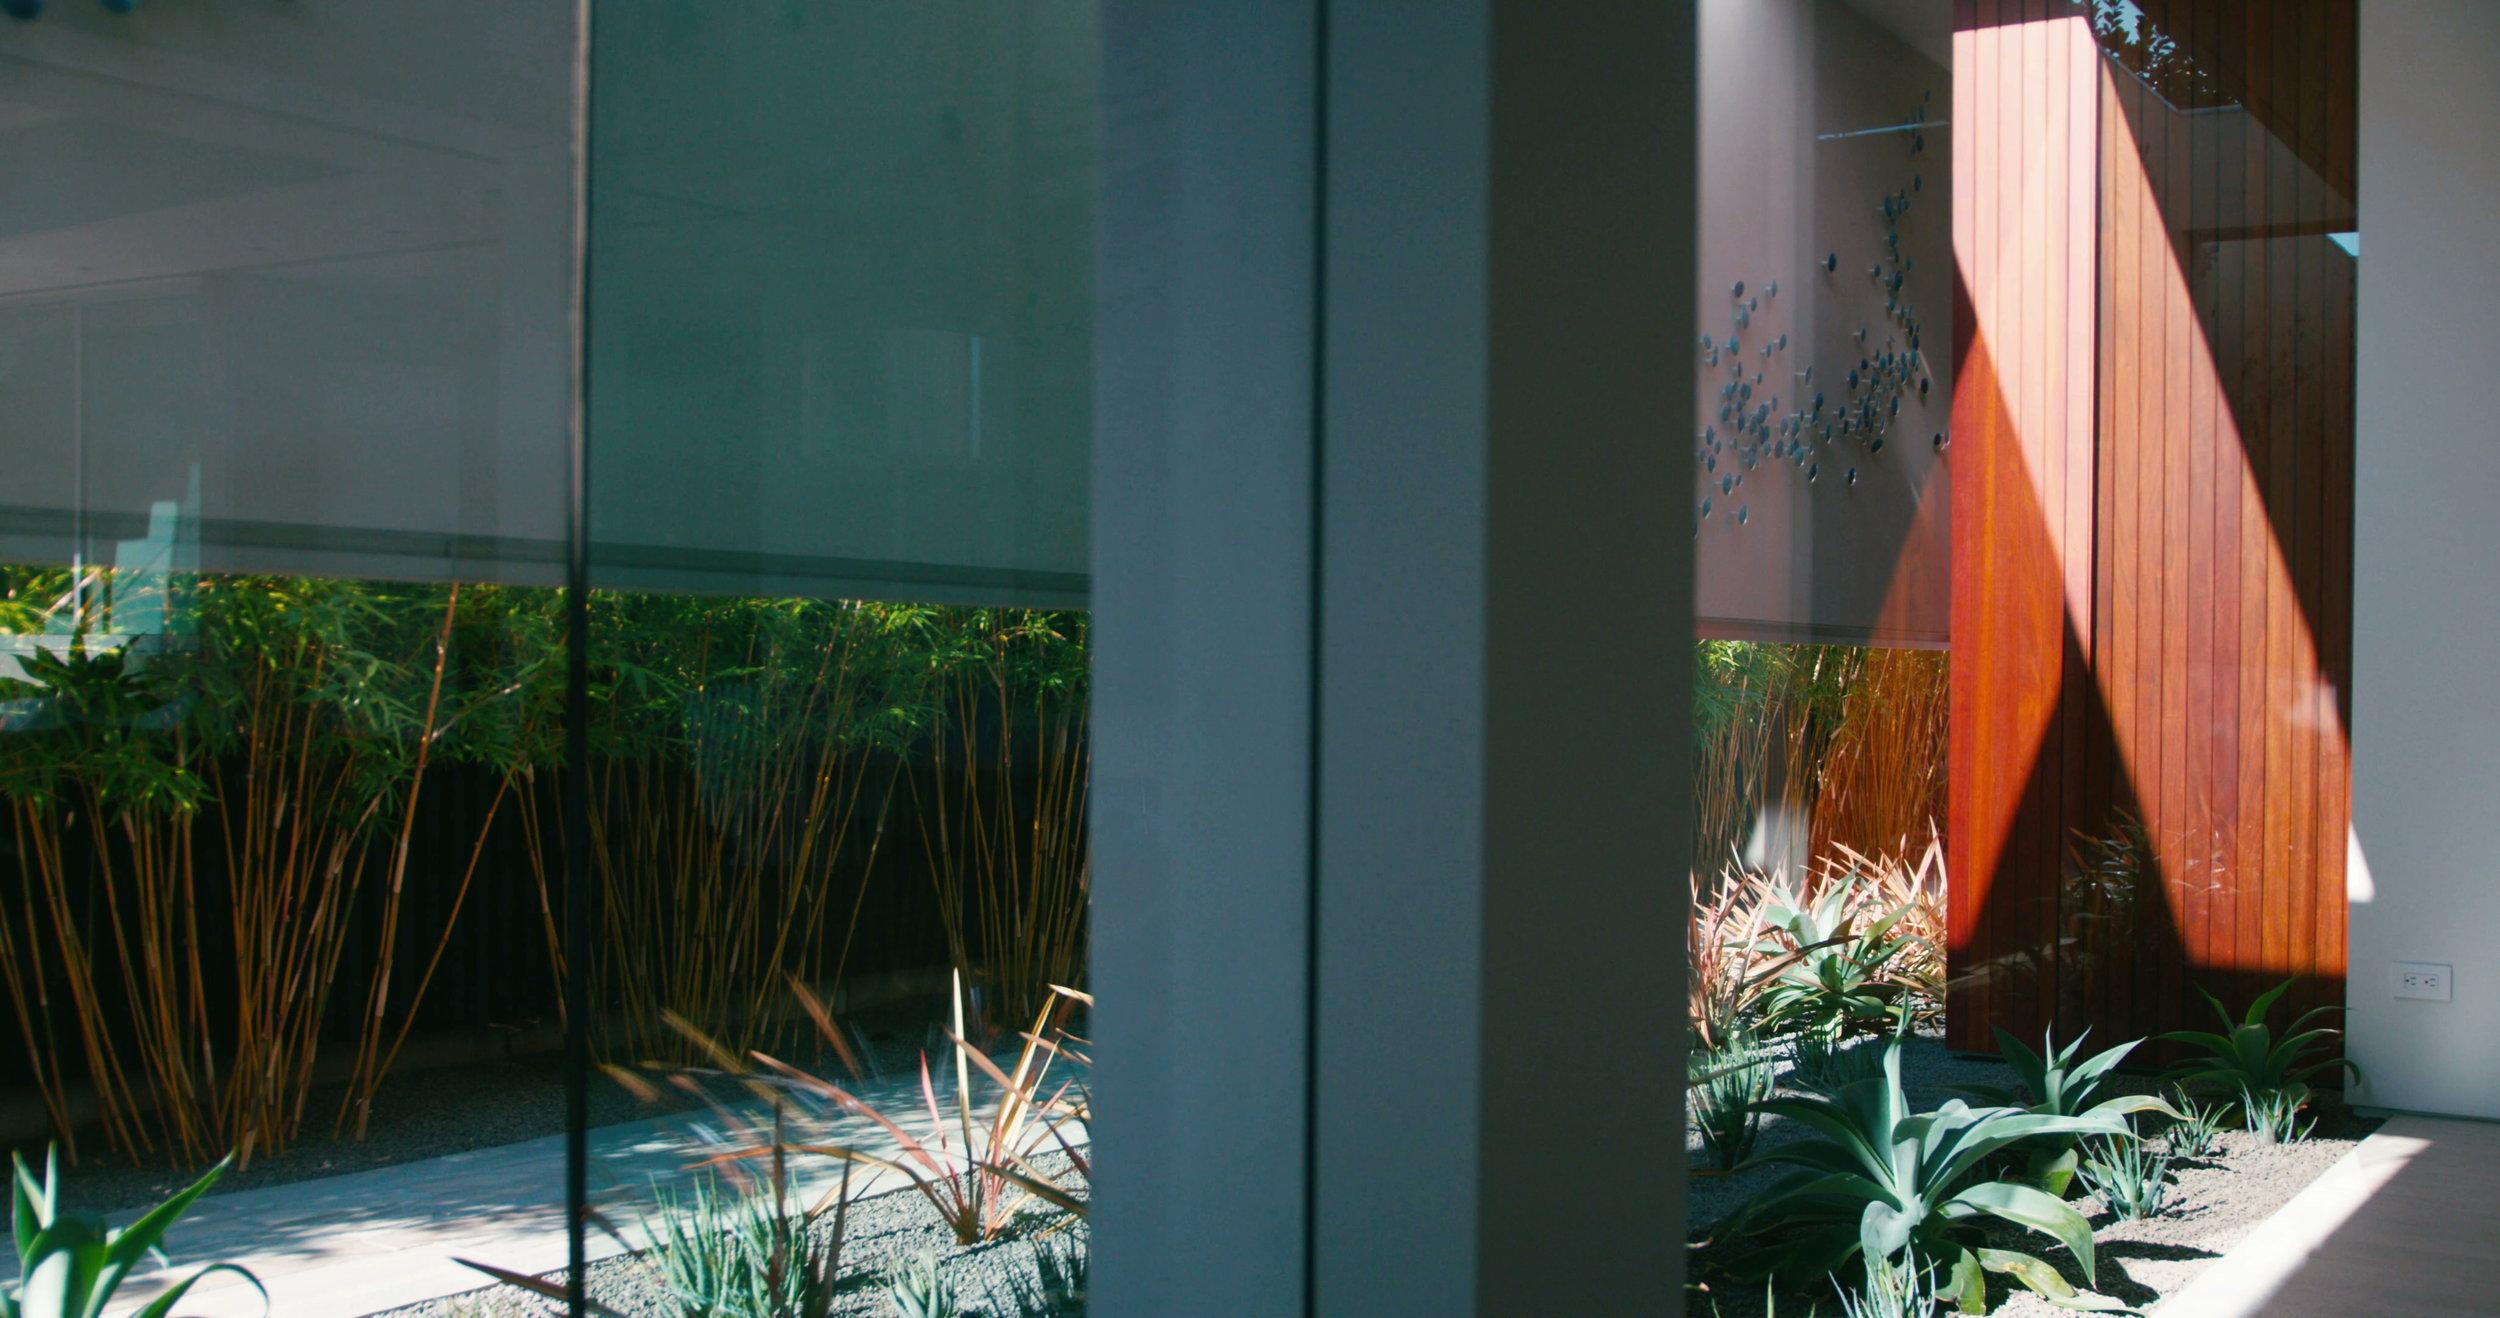 Verge house-4.jpeg